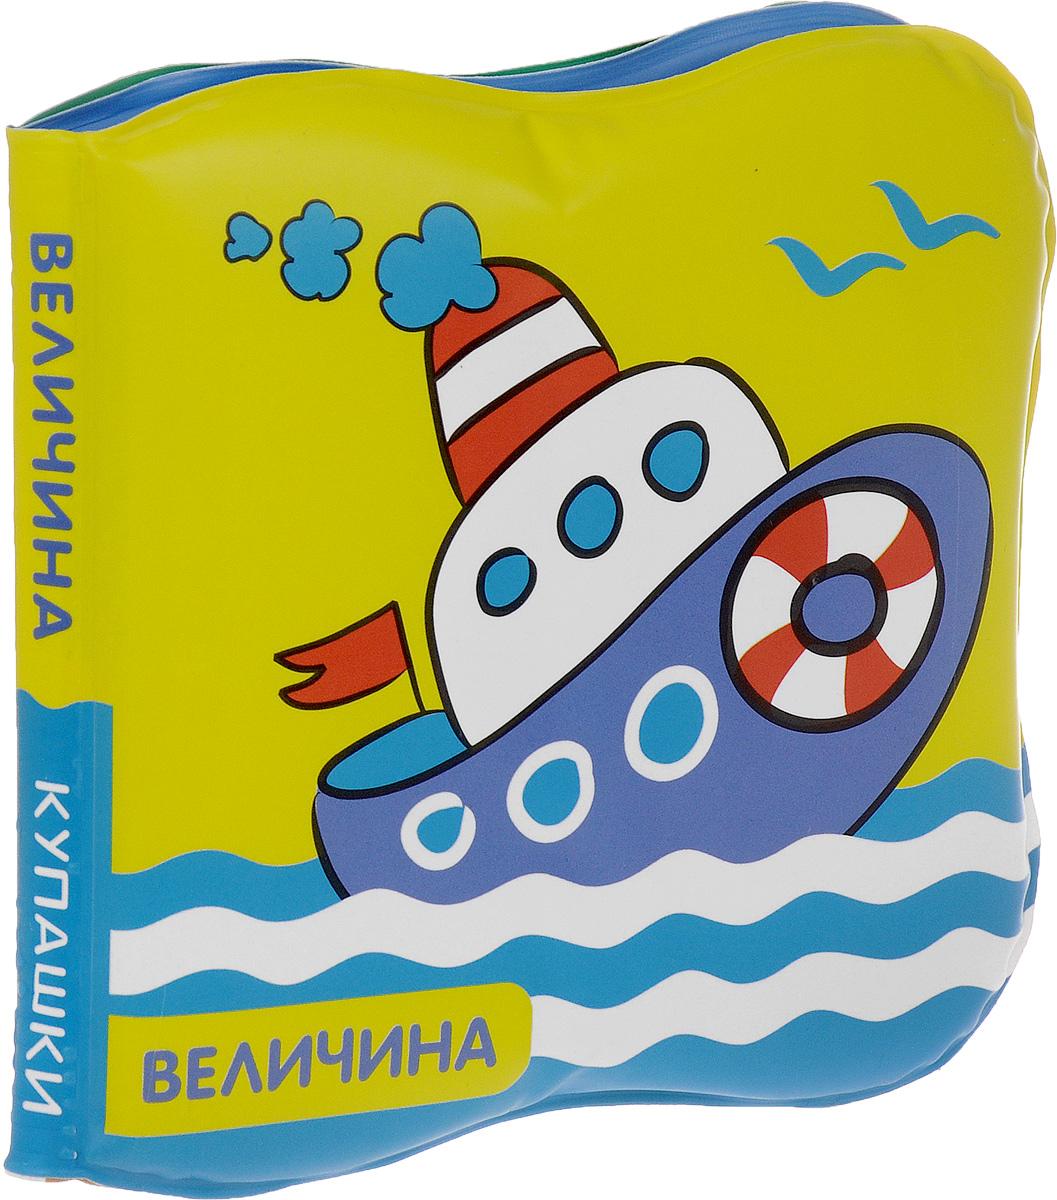 Кораблик. Величина ( 978-5-4315-0597-3 )